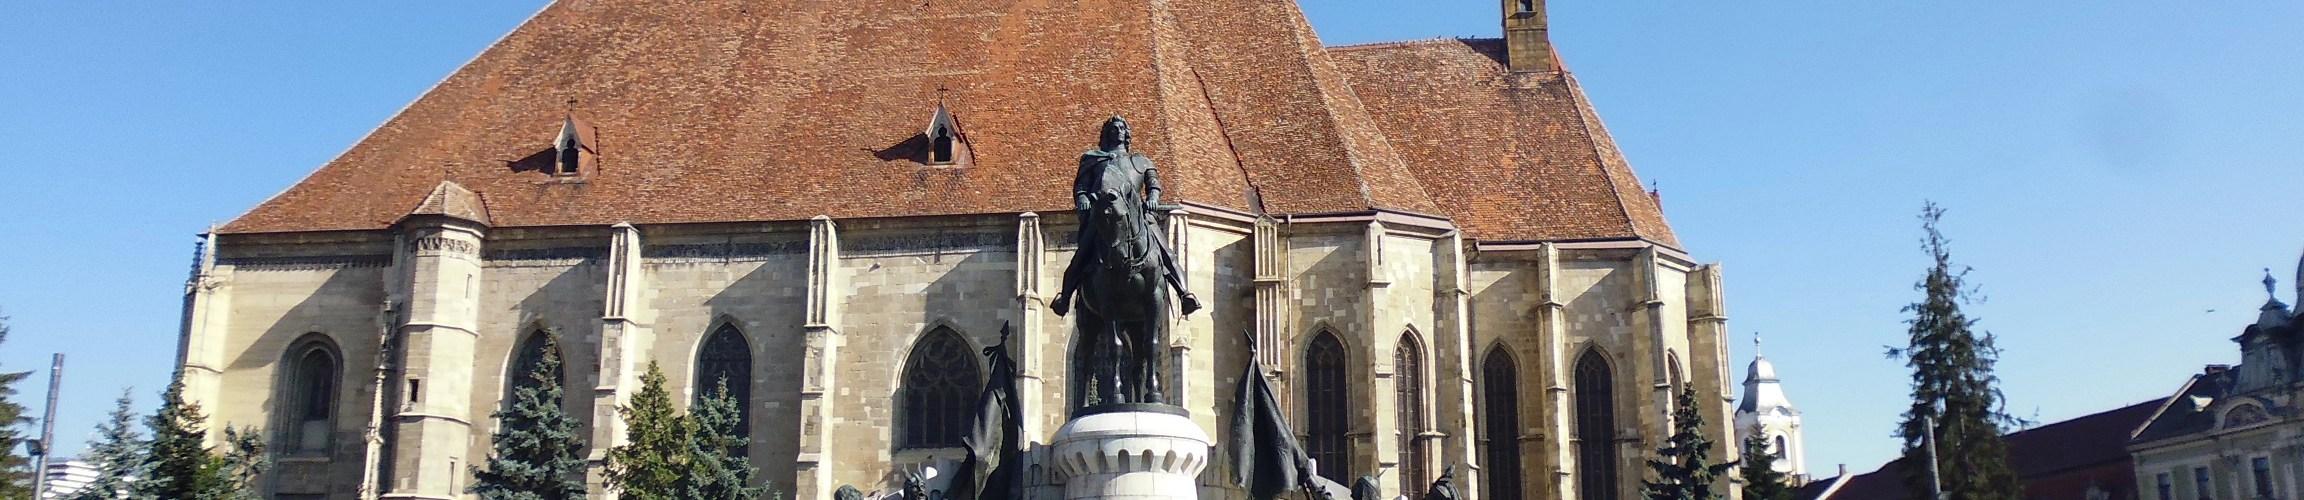 The statue of Matthias Corvinus and St. Michael's Church